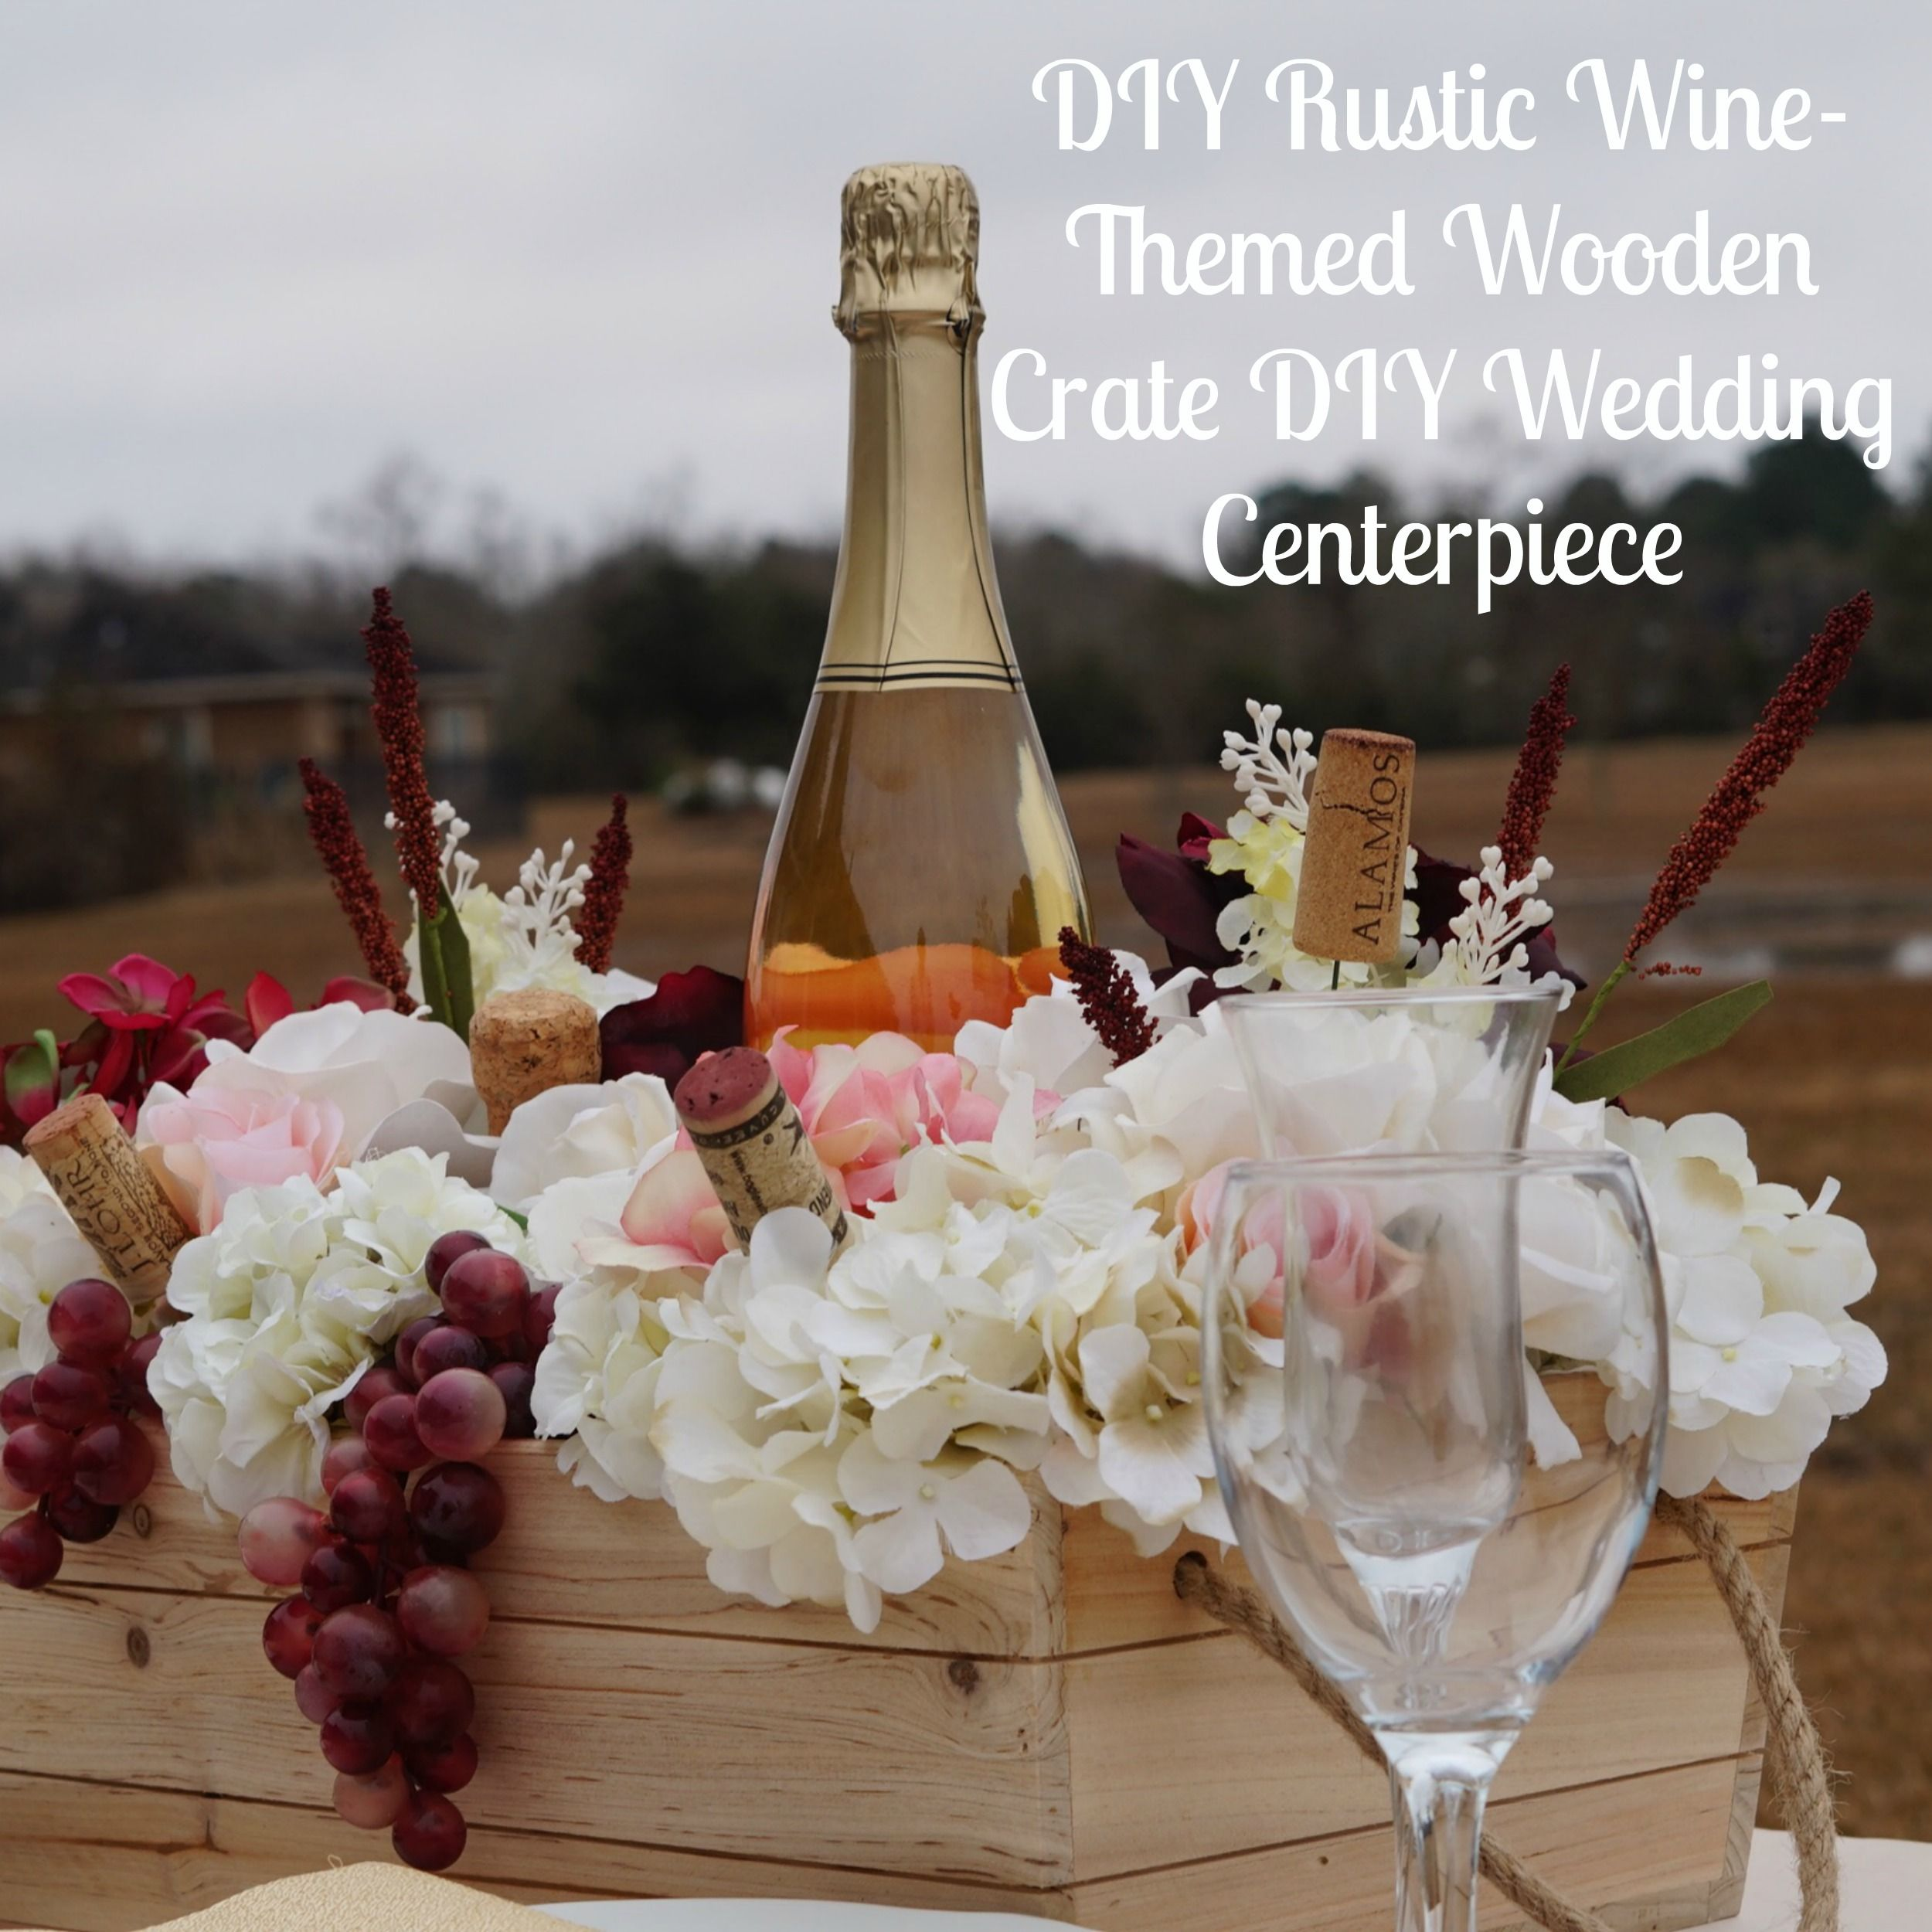 Rustic Wine Themed Wooden Crate DIY Wedding Centerpiece  Wooden